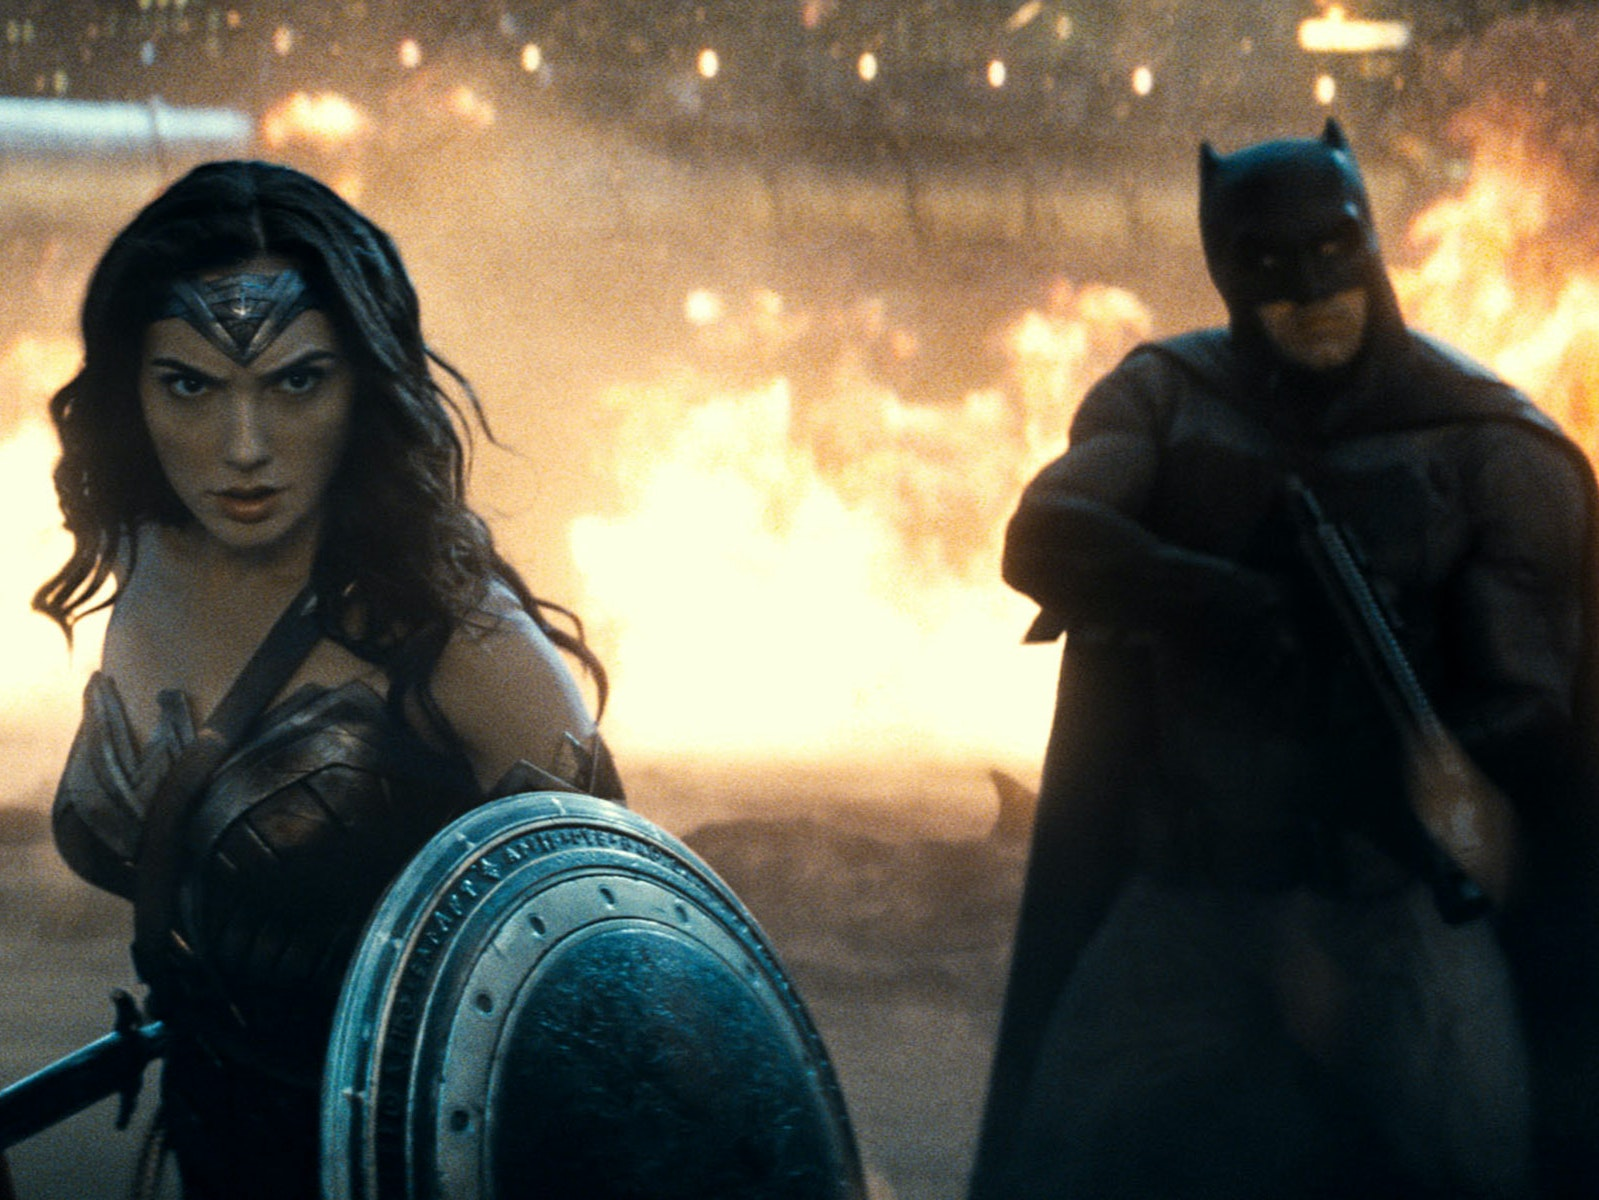 Let's Get Batman and Wonder Woman on TV